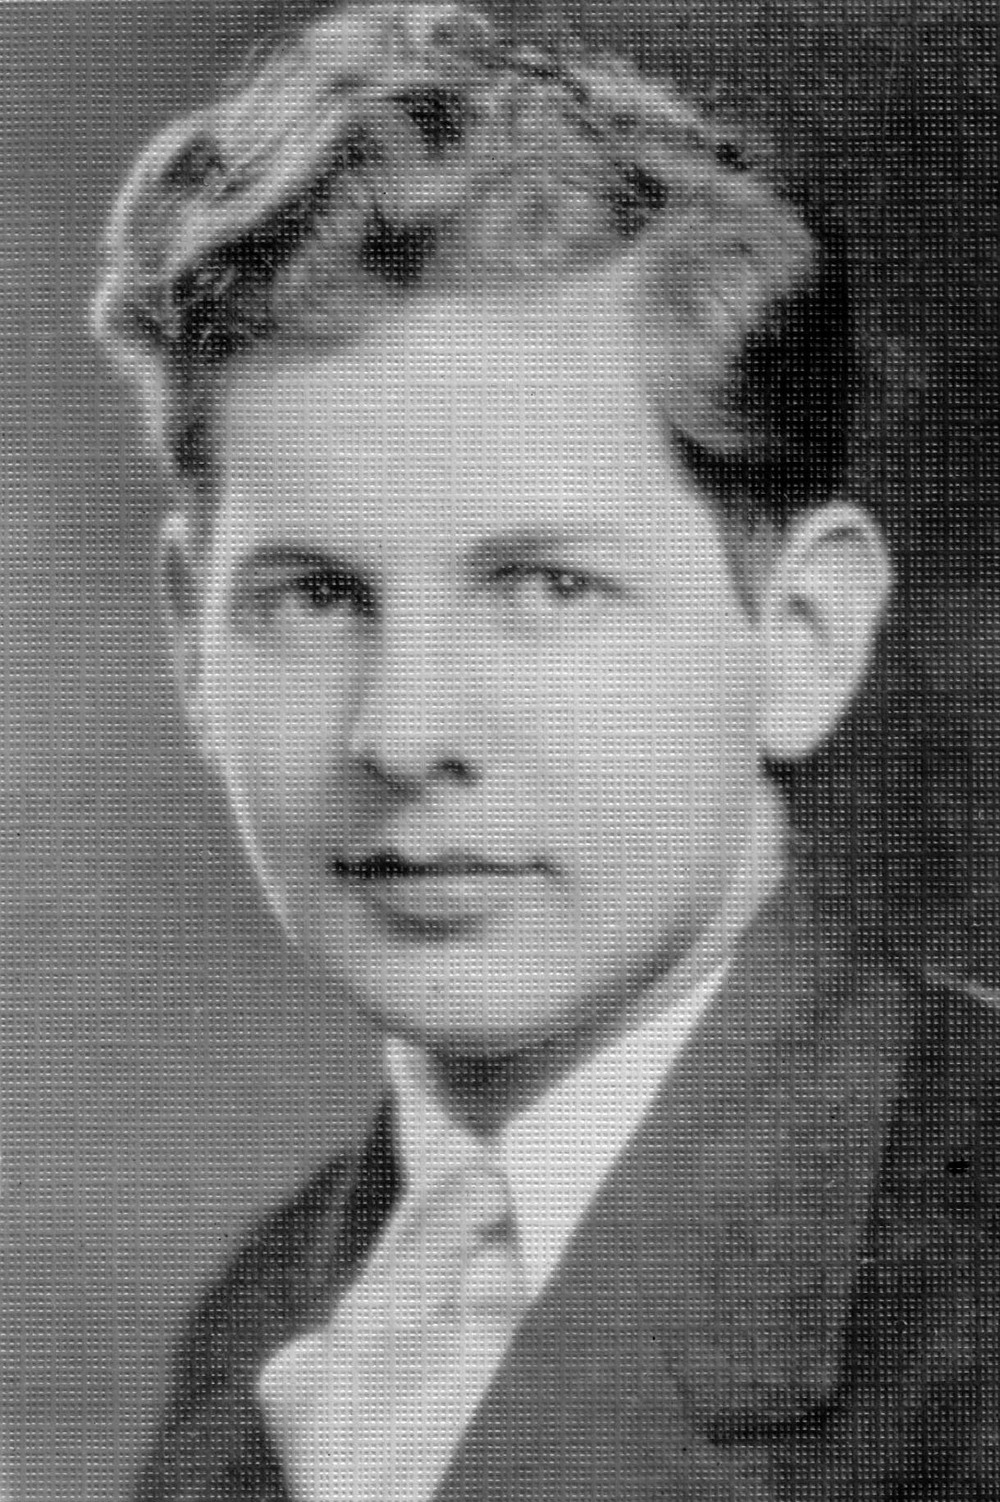 Gerald F. Kunkle 1932